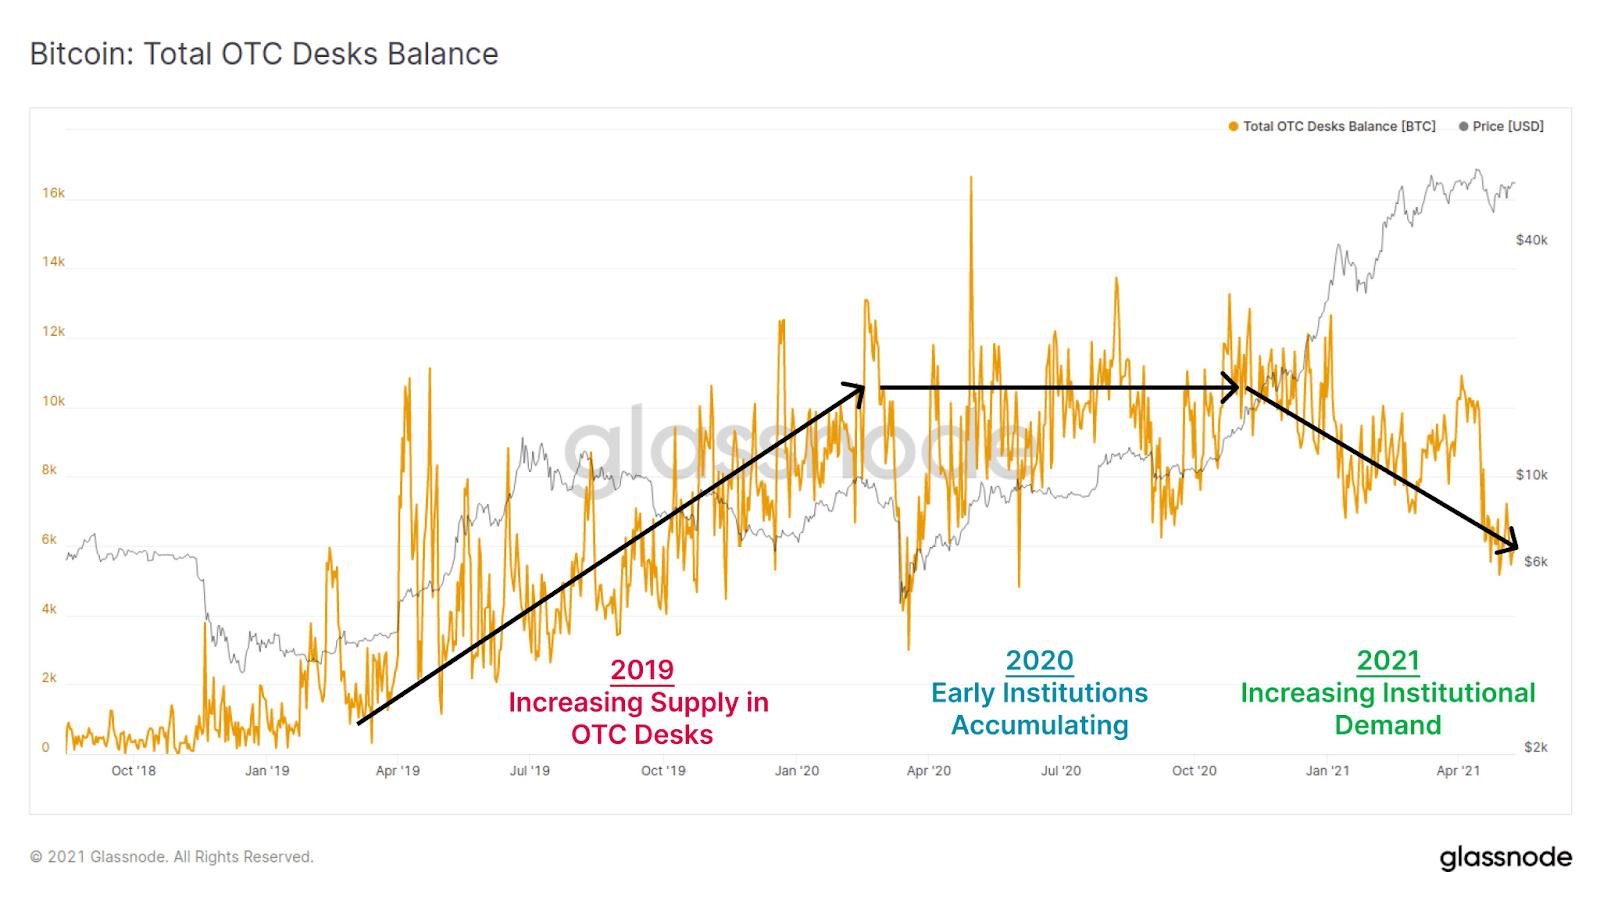 Bitcoin BTC Total OTC Desks Balance